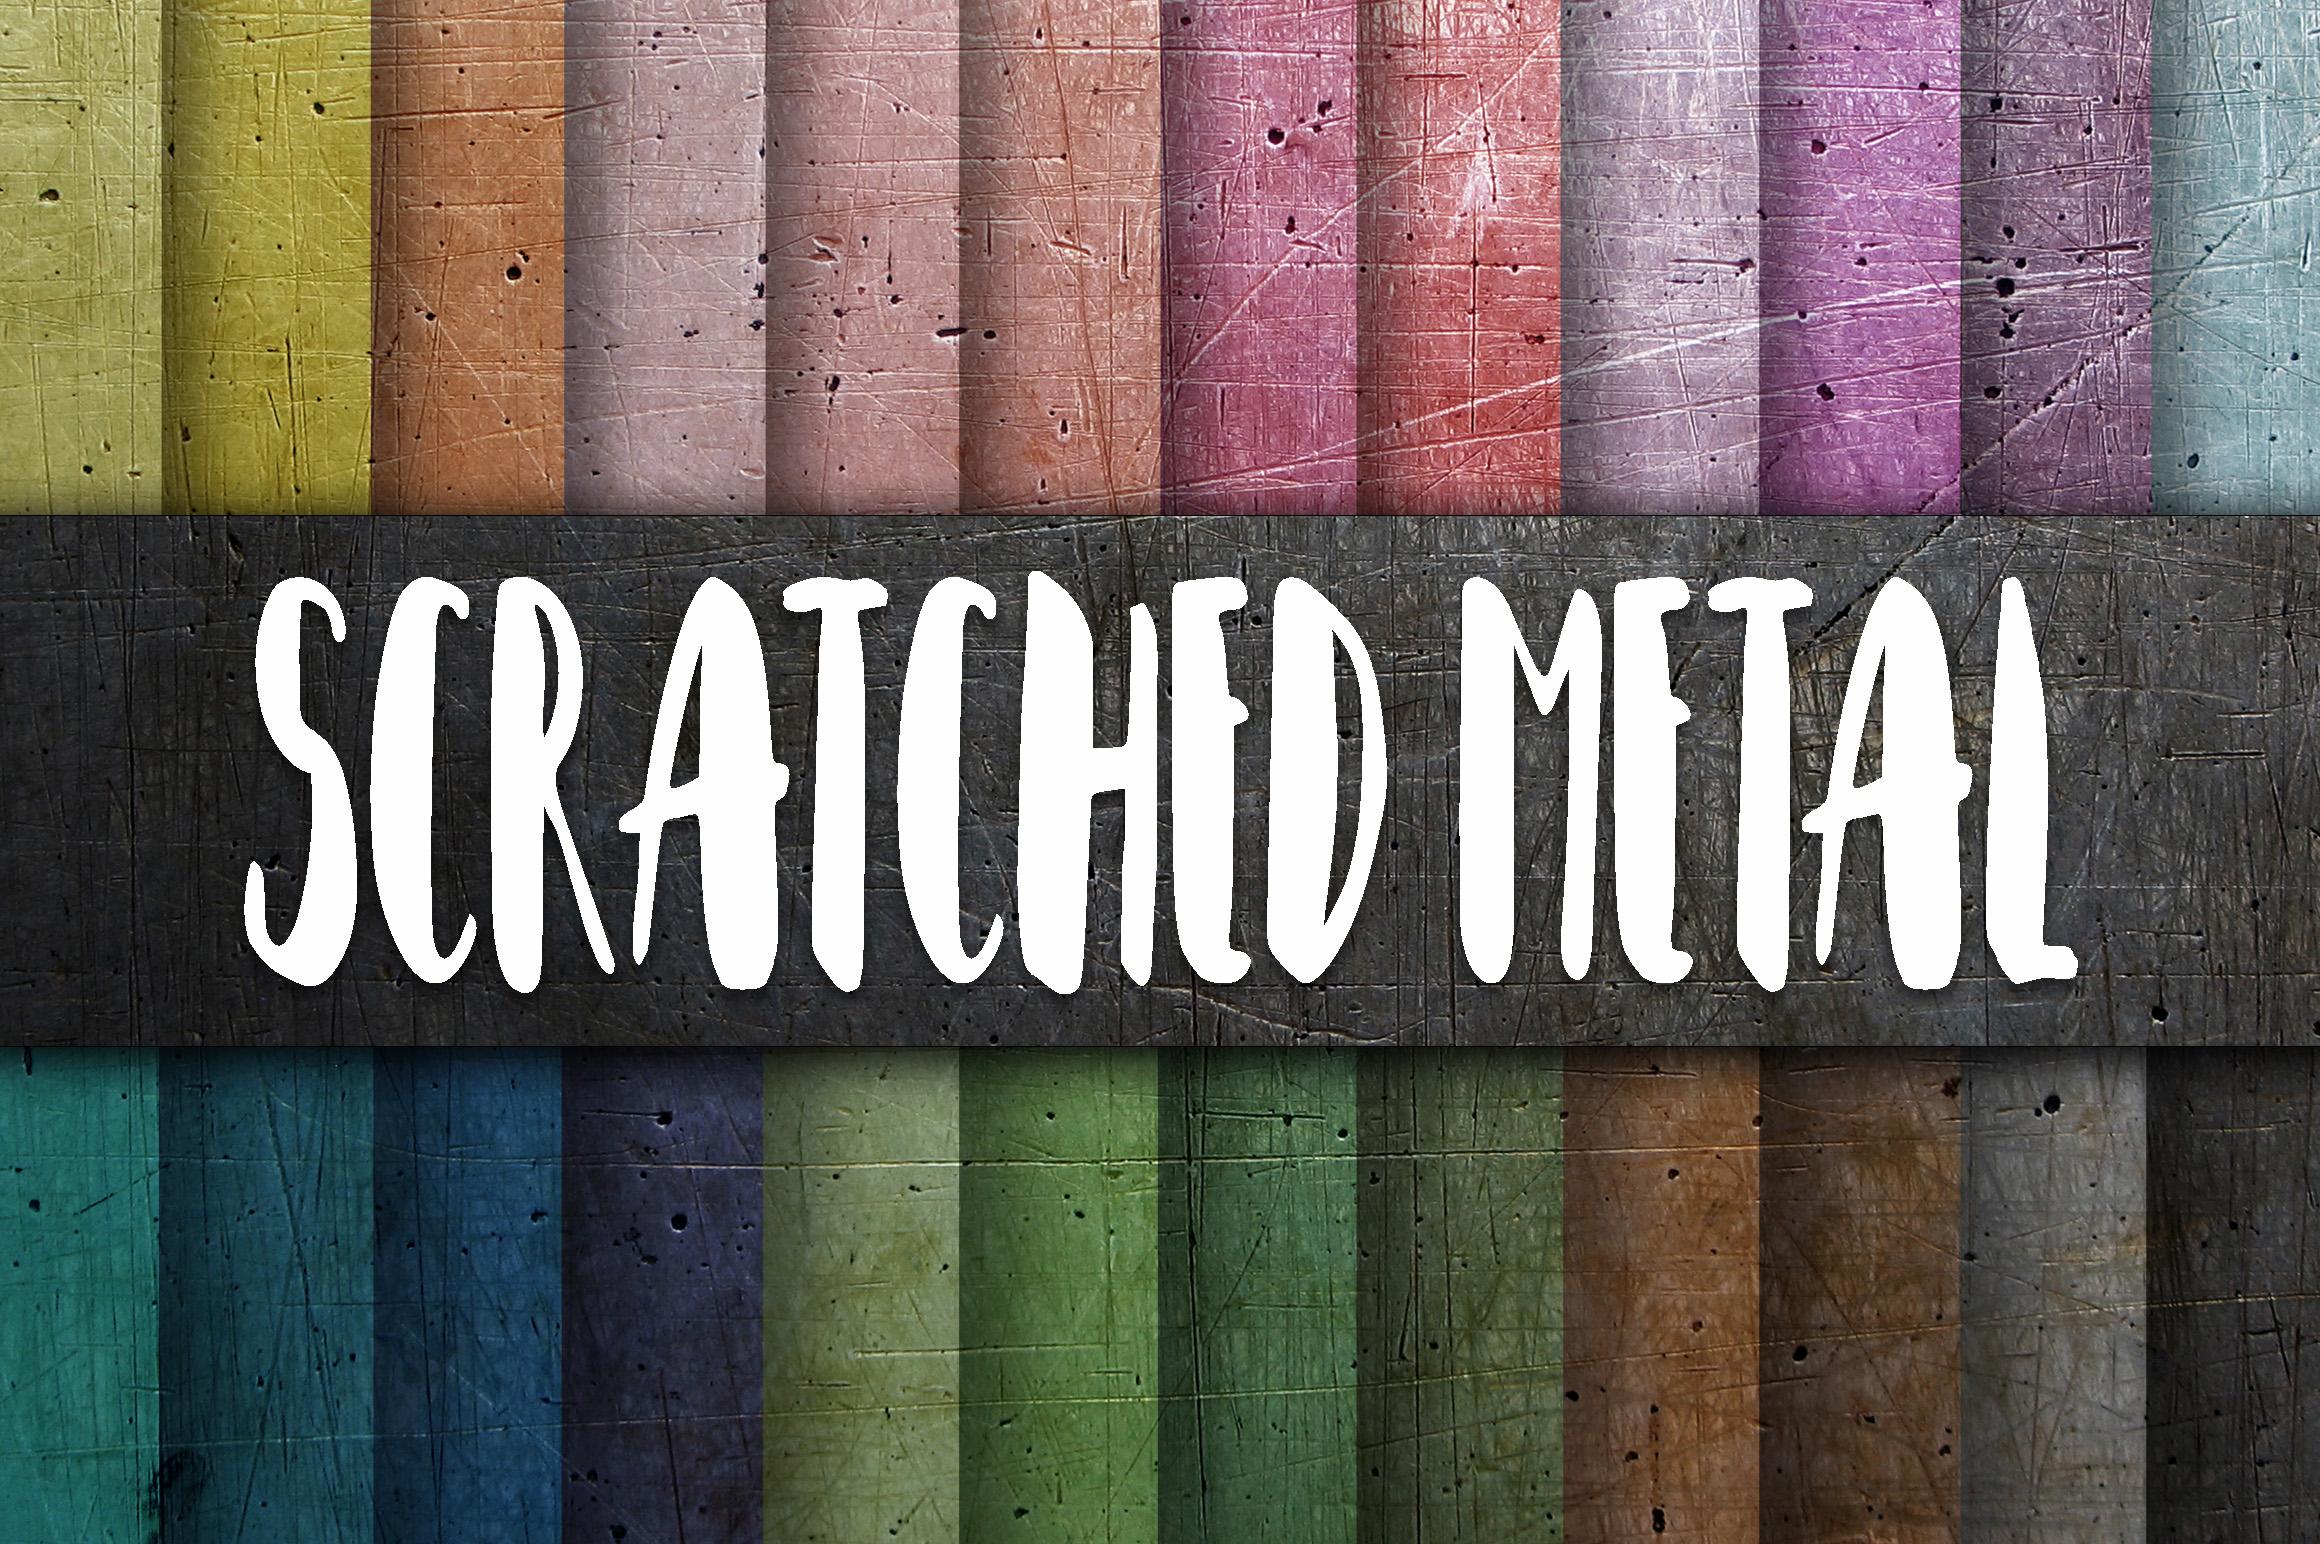 Scratched Metal Textures Digital Paper example image 1